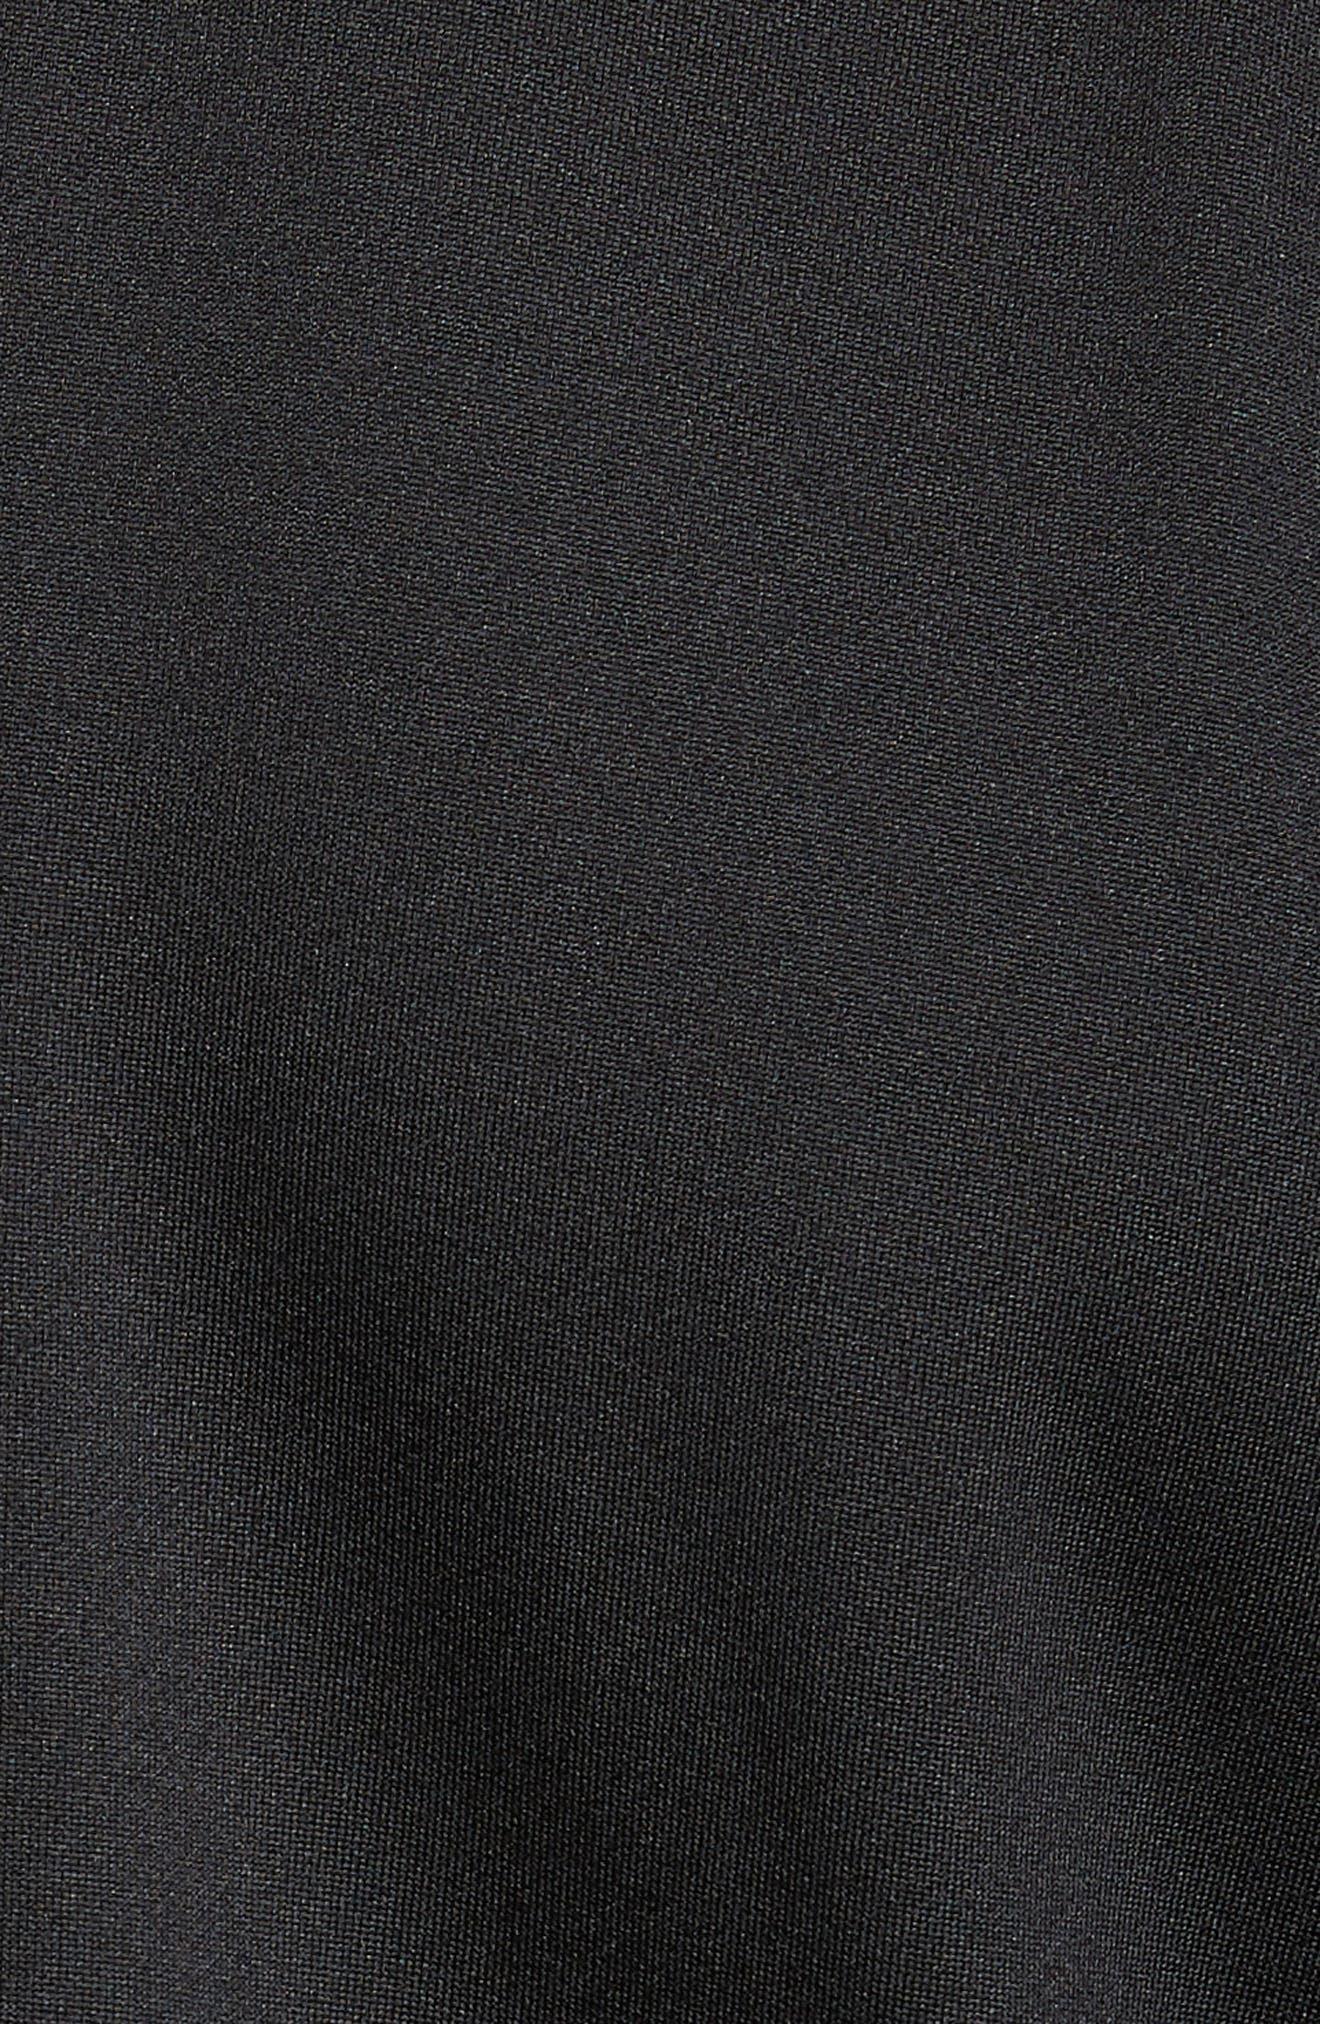 CoolMax<sup>®</sup> Track Jacket,                             Alternate thumbnail 6, color,                             001